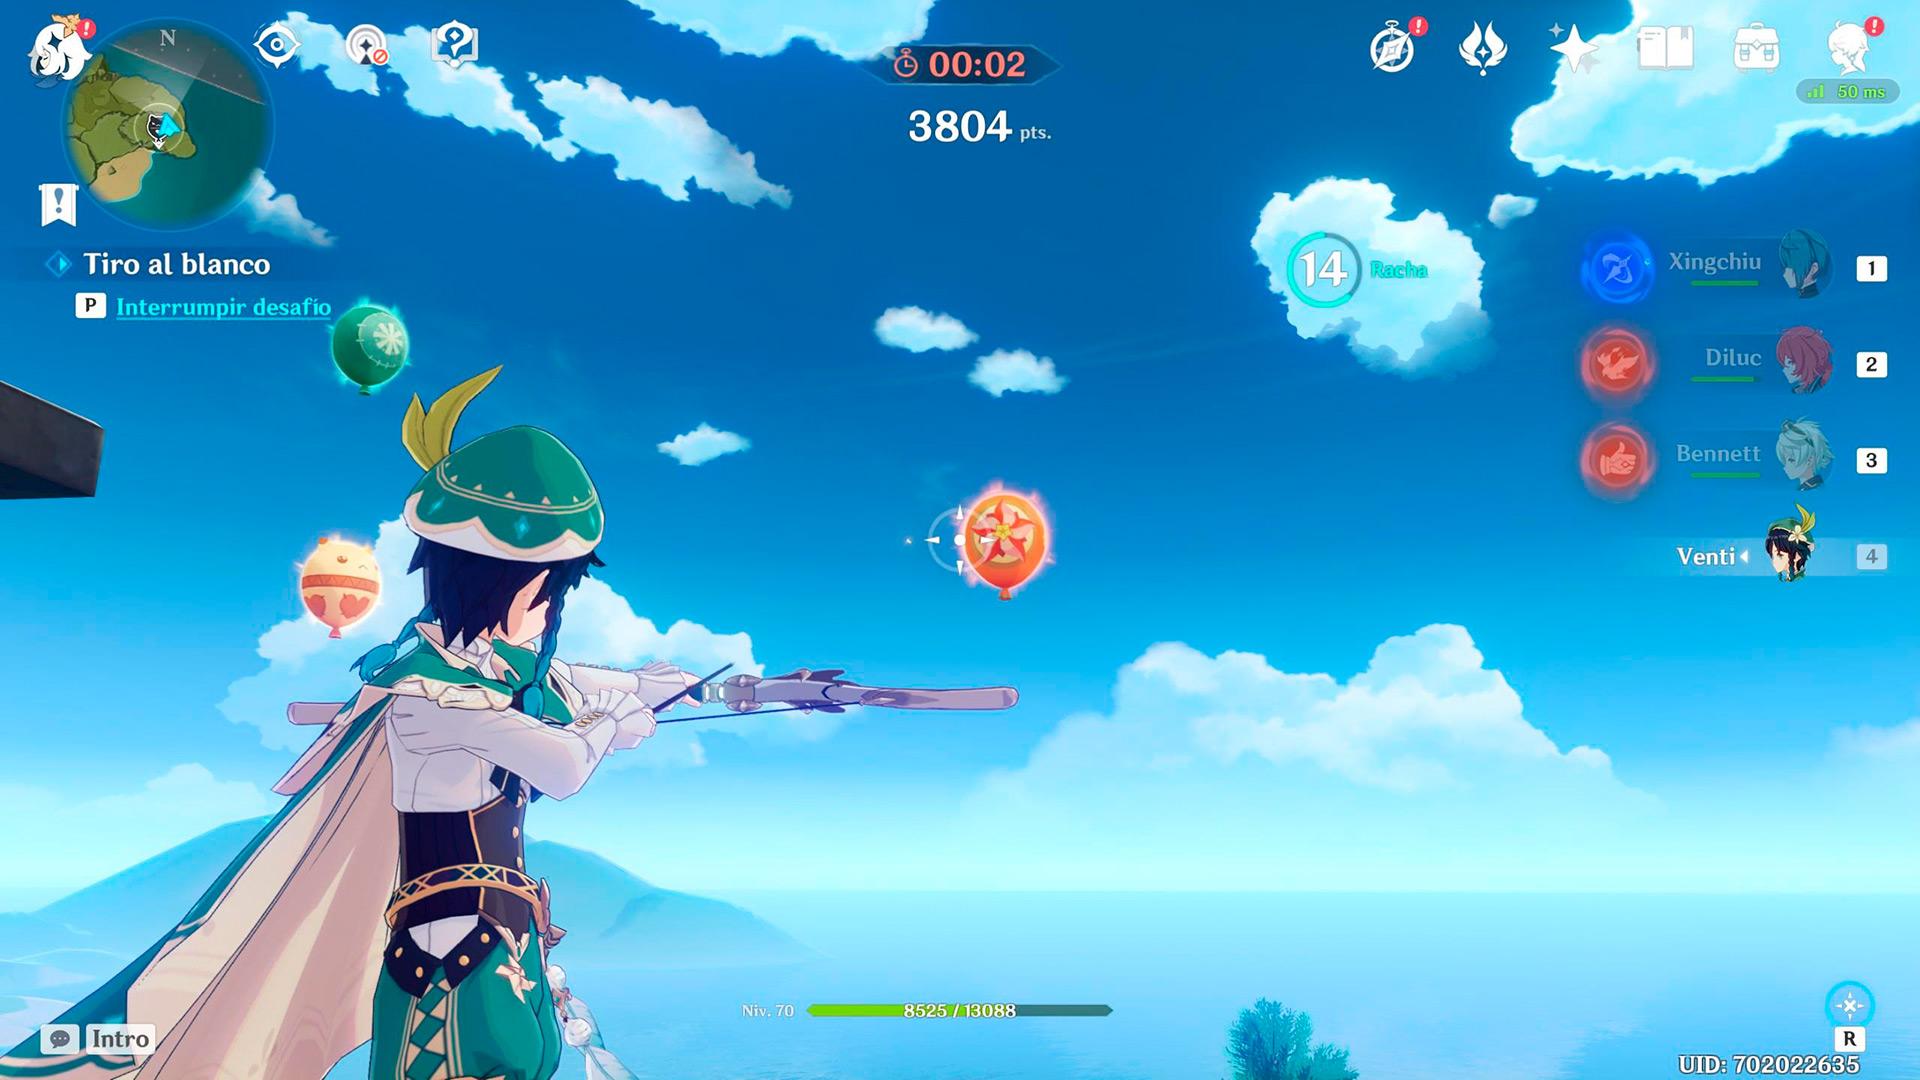 genshin impact desafío tiro al blanco vals de la torre disparando a globos